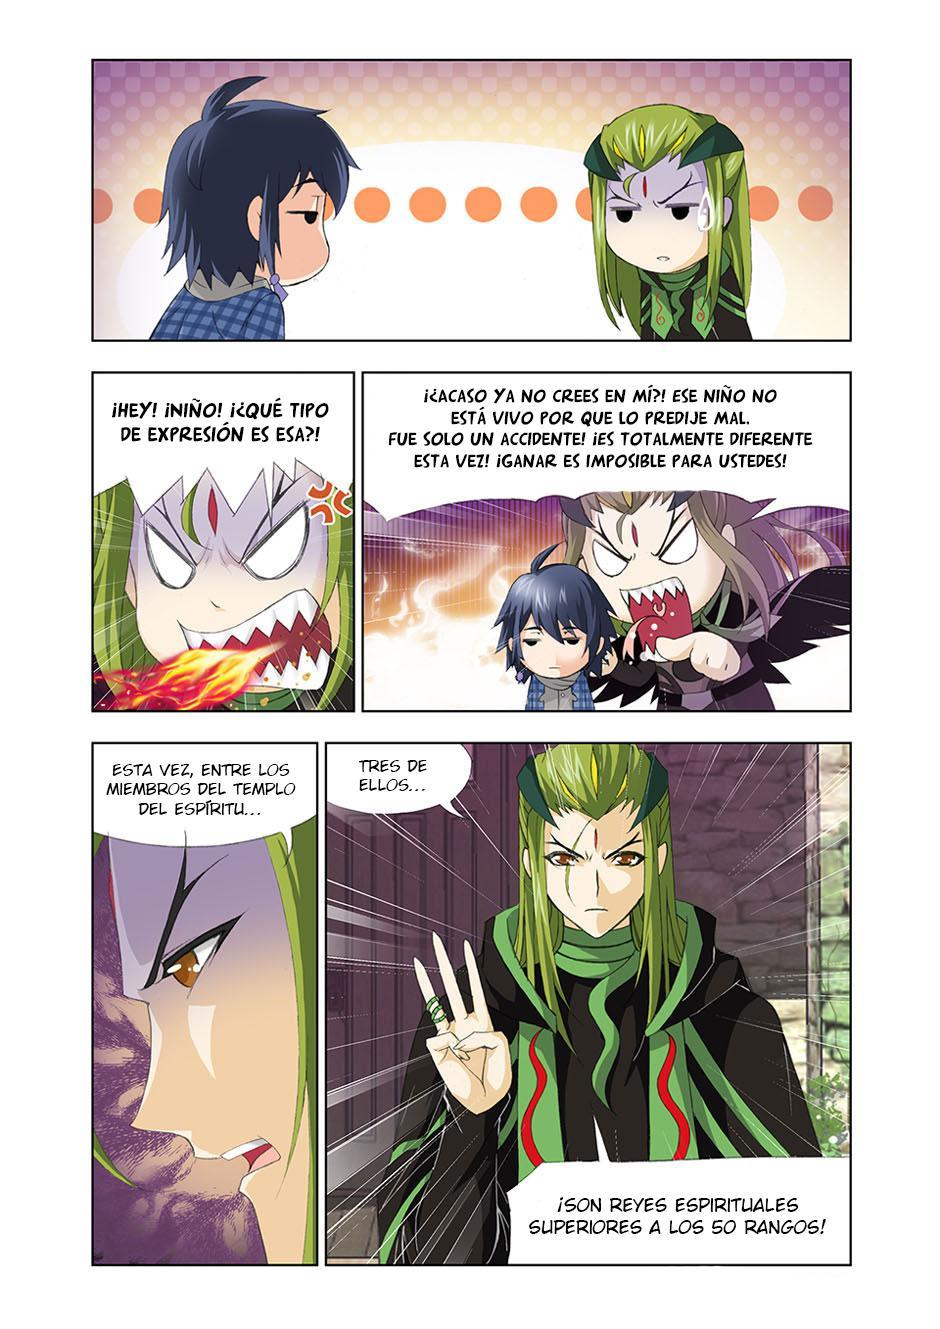 https://c5.ninemanga.com/es_manga/18/16210/417006/4a342b9eaf180eaf3c3e068570ae3854.jpg Page 4